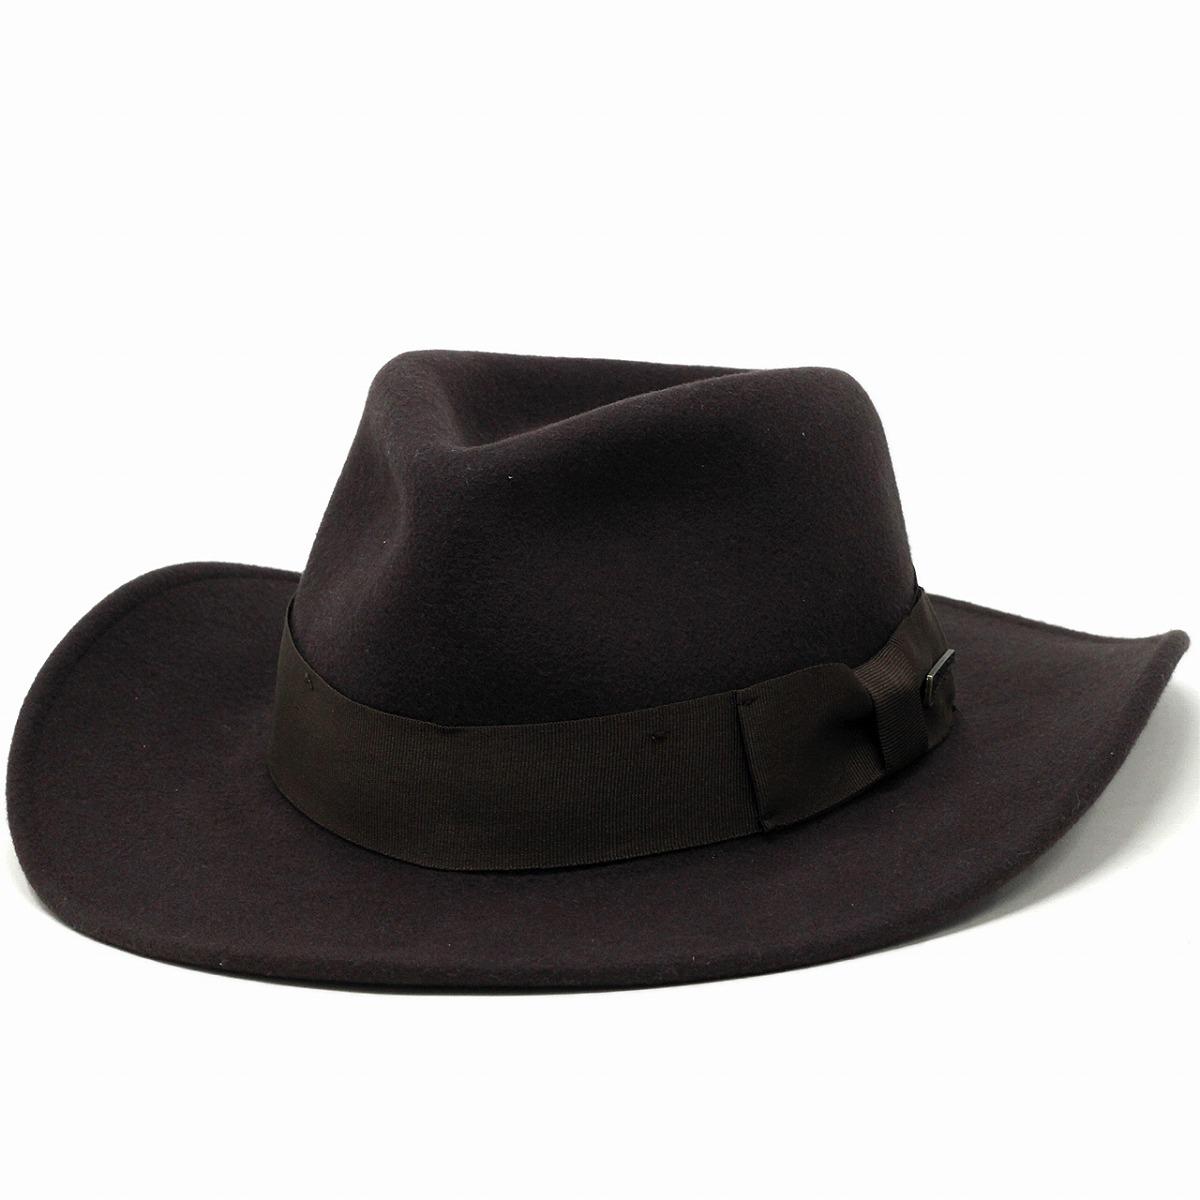 fcde7f26959 ELEHELM HAT STORE  Indiana Jones Hat wide brim crushable wool felt men s  outback Hat Disney winter   Brown